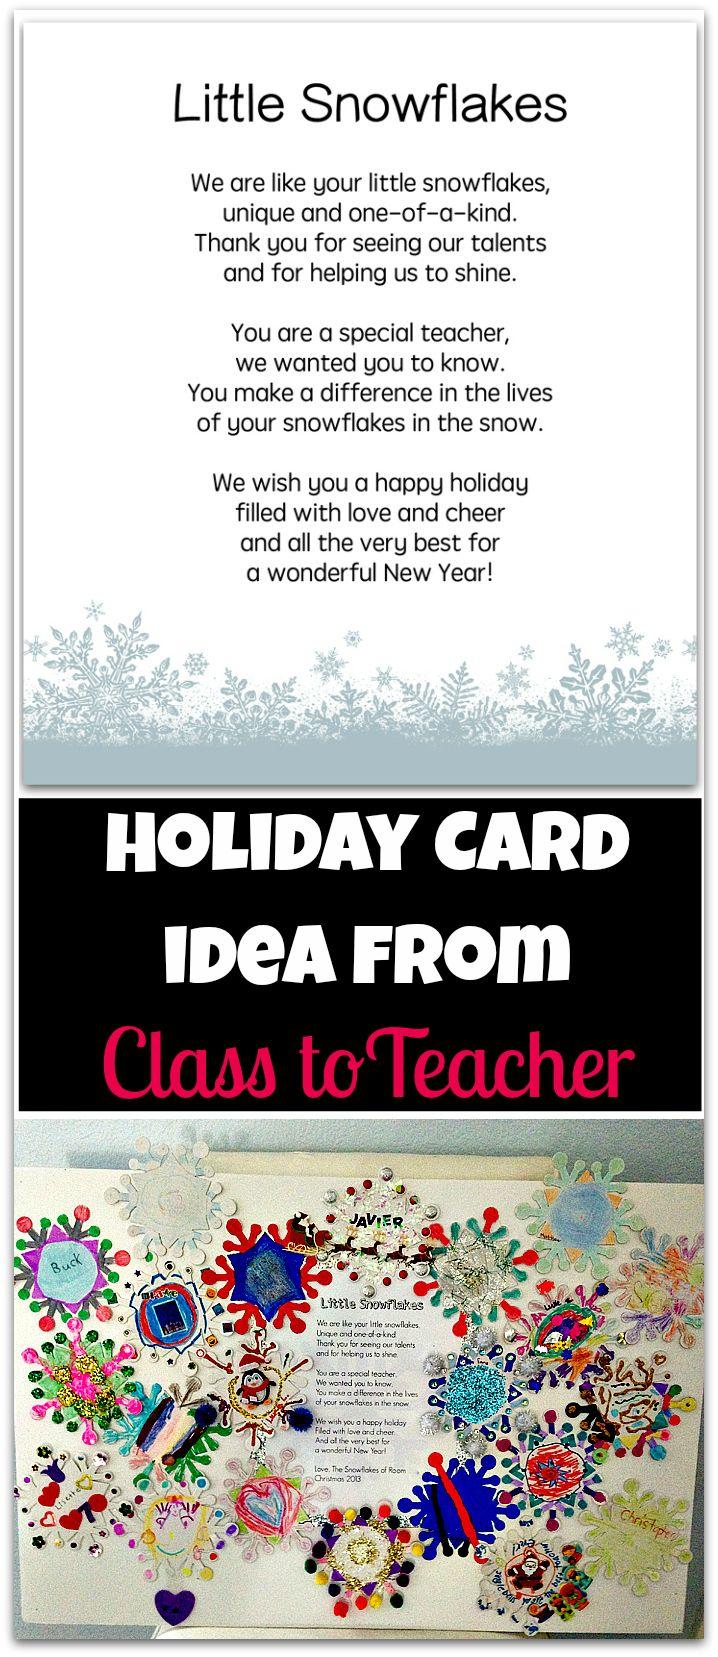 Holiday Card Idea From Class To Teacher Teacher Holiday Gifts Teacher Cards Teacher Gifts From Class